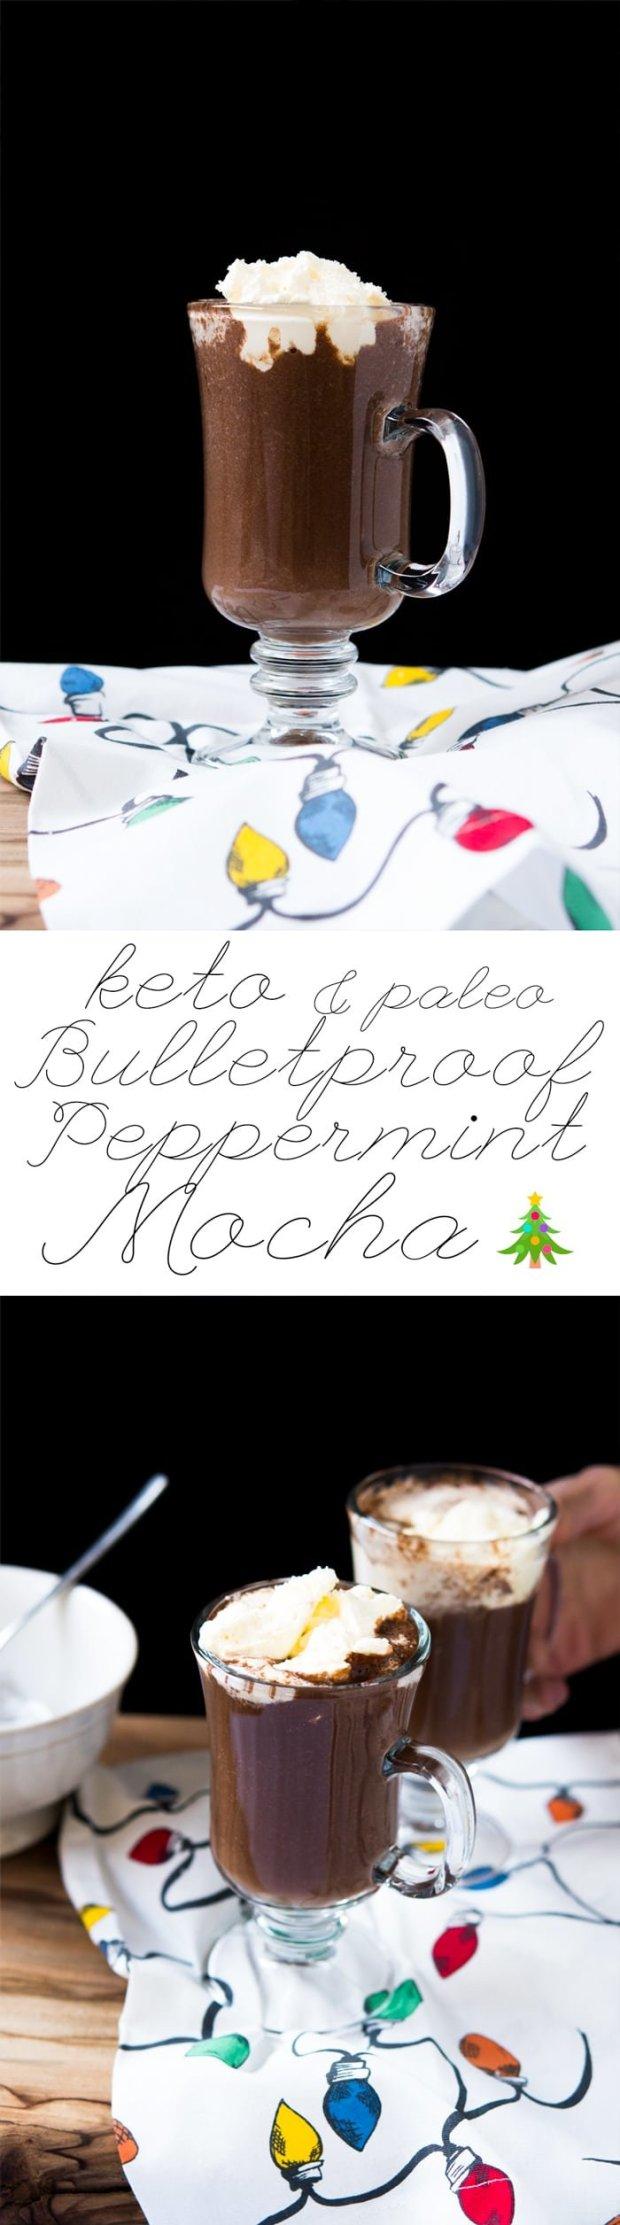 Paleo & Keto Bulletproof Peppermint Mocha 🎄Thick, Creamy and just 2g net carbs! #ketopeppermintmocha #bpc